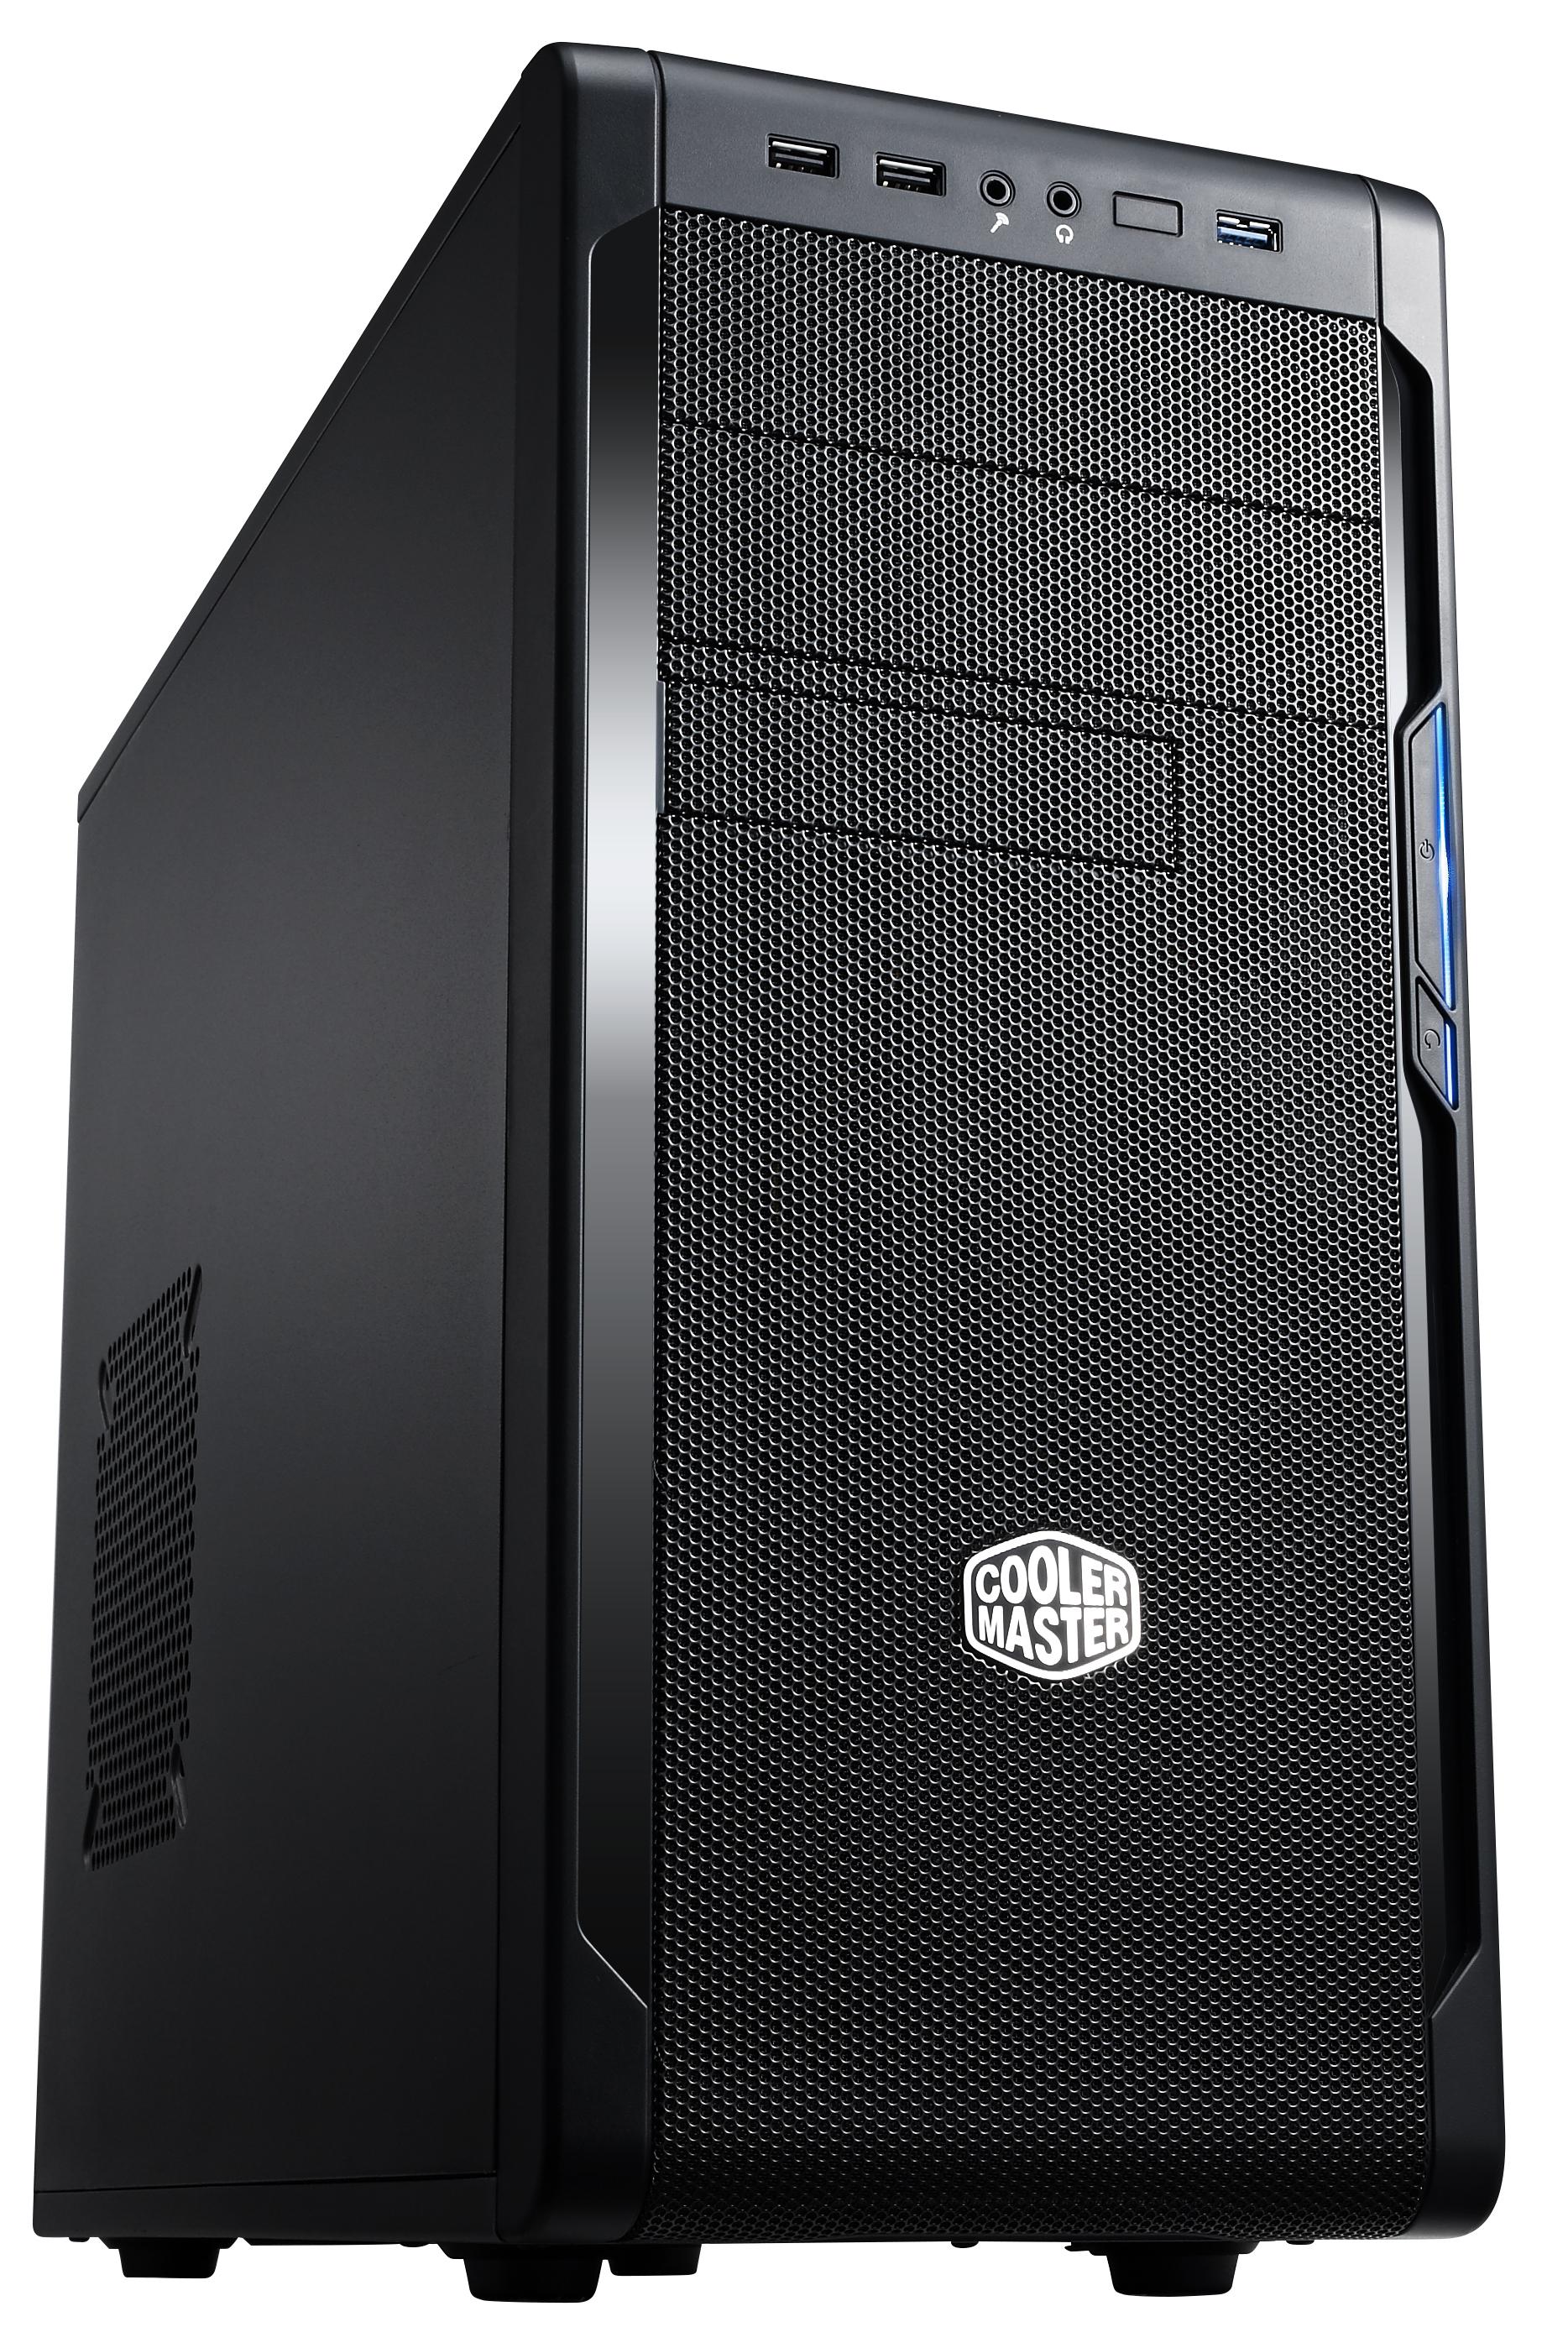 Cooler Master N300 Midi-Tower Black